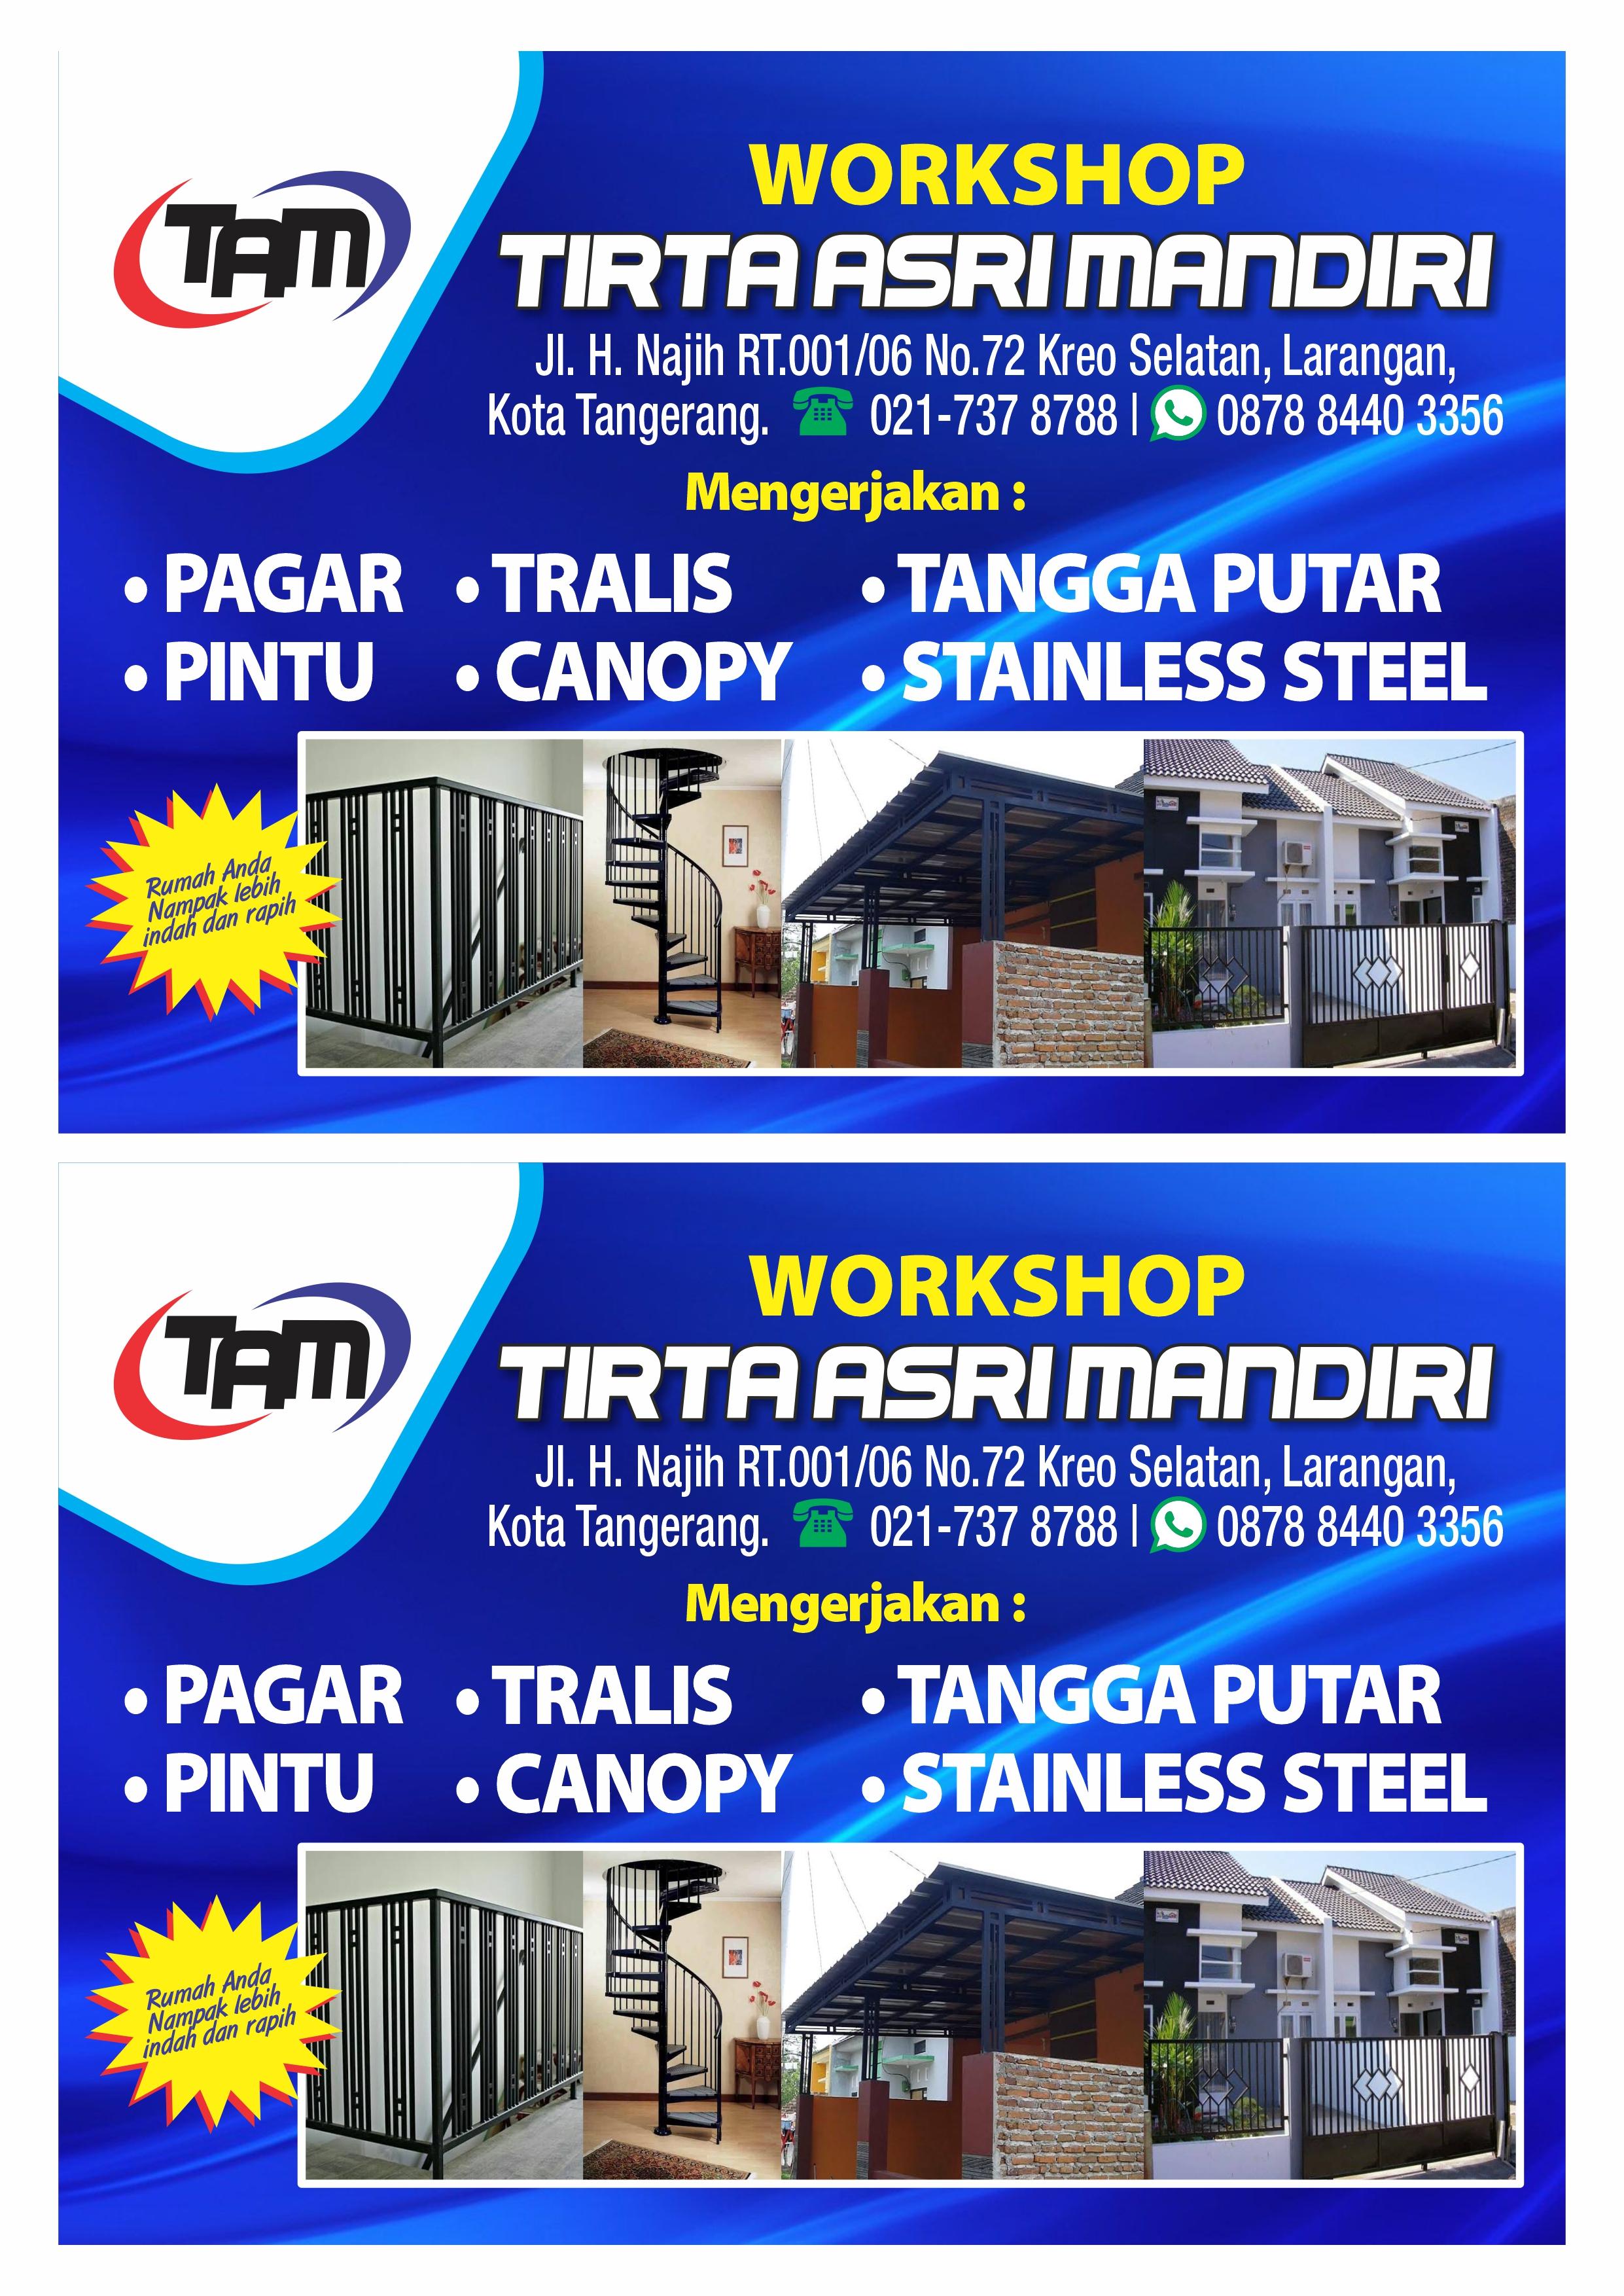 Tirta Asri Mandiri_Brosur